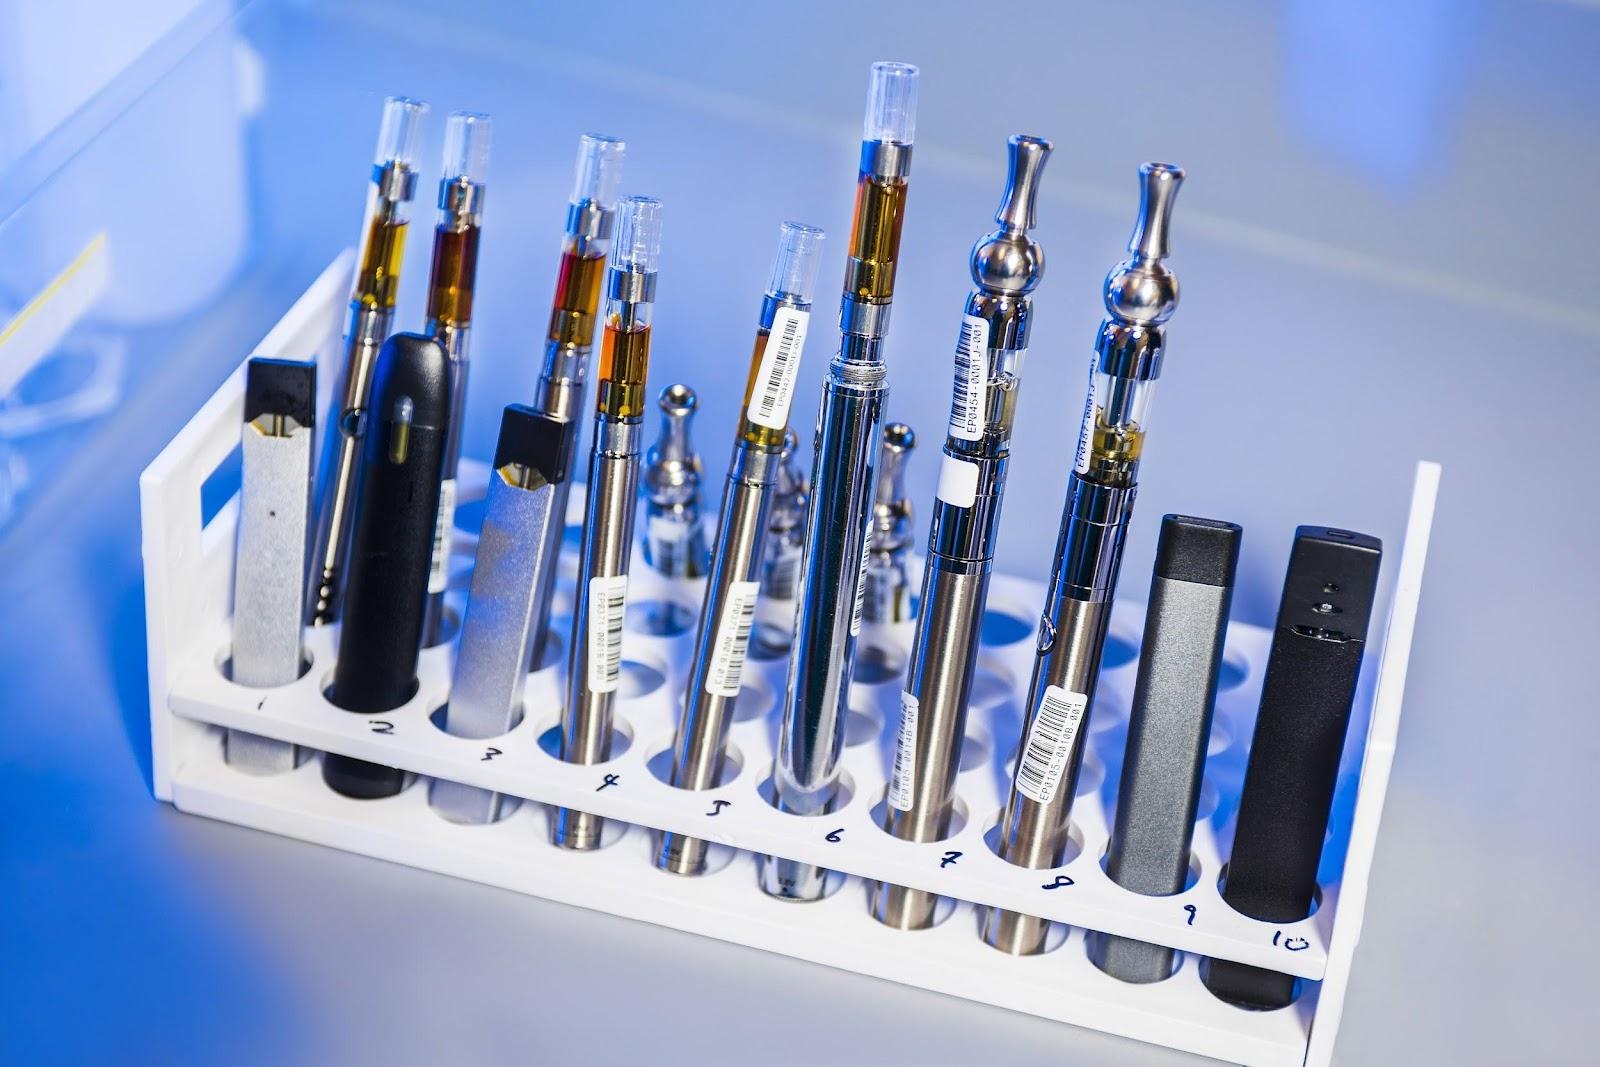 Different vape pens